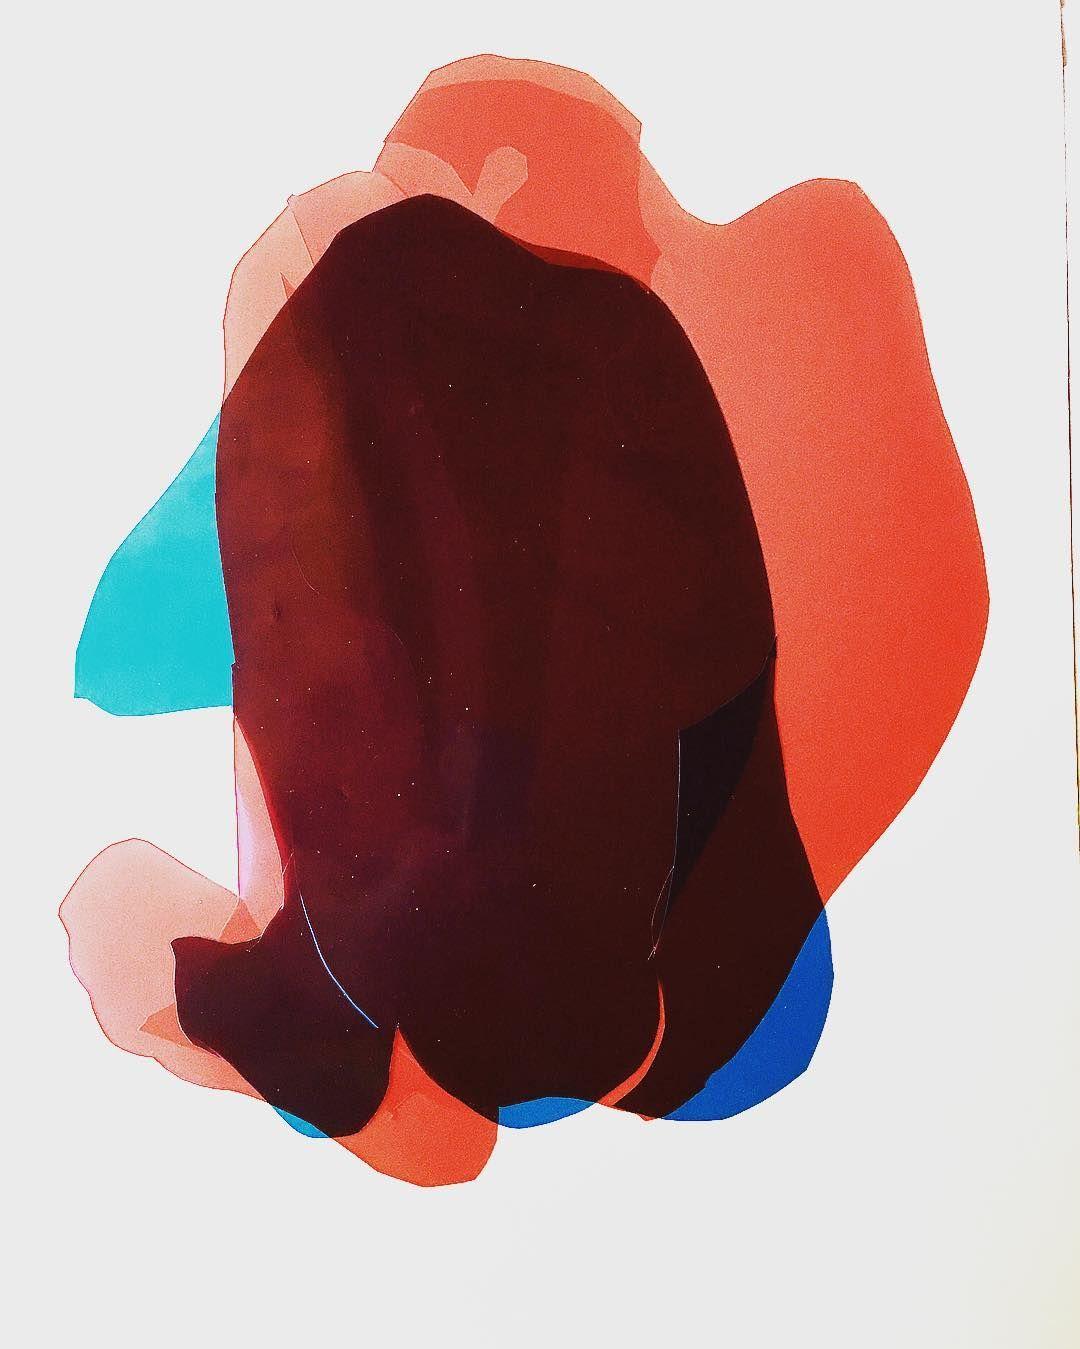 "Gefällt 30 Mal, 1 Kommentare - James Thomas (@jamesathomas) auf Instagram: ""Nude study #collage #paper #cutout #print #nude #silhouette #woman #sketchbook #artwork…"""